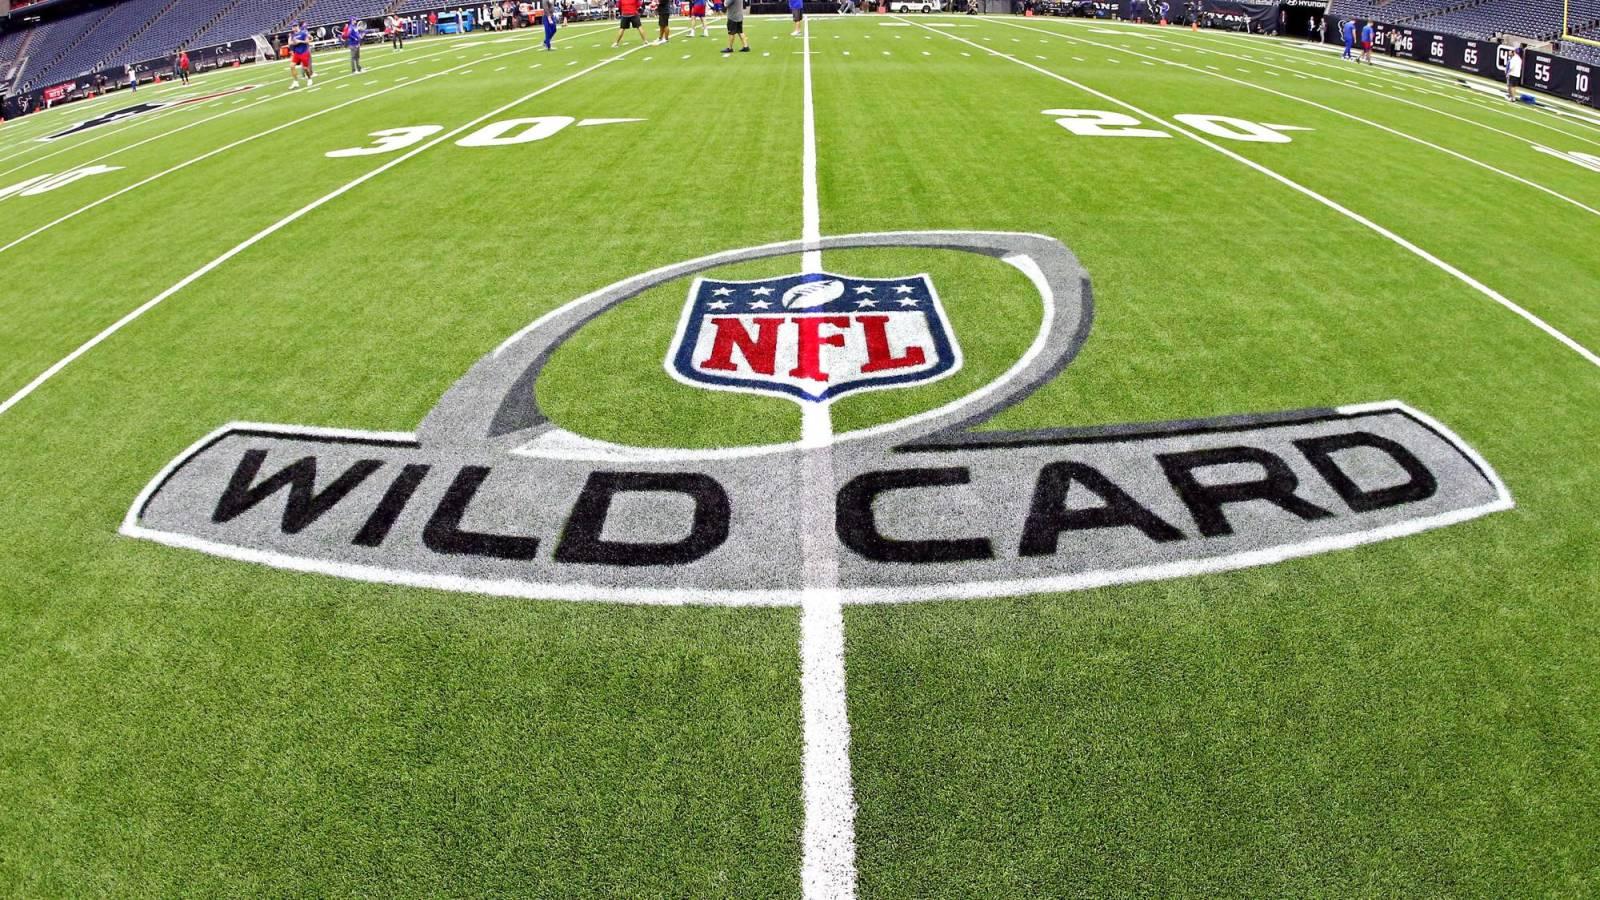 NFL: Satu dari enam pertandingan wild-card akan dimainkan pada Senin malam